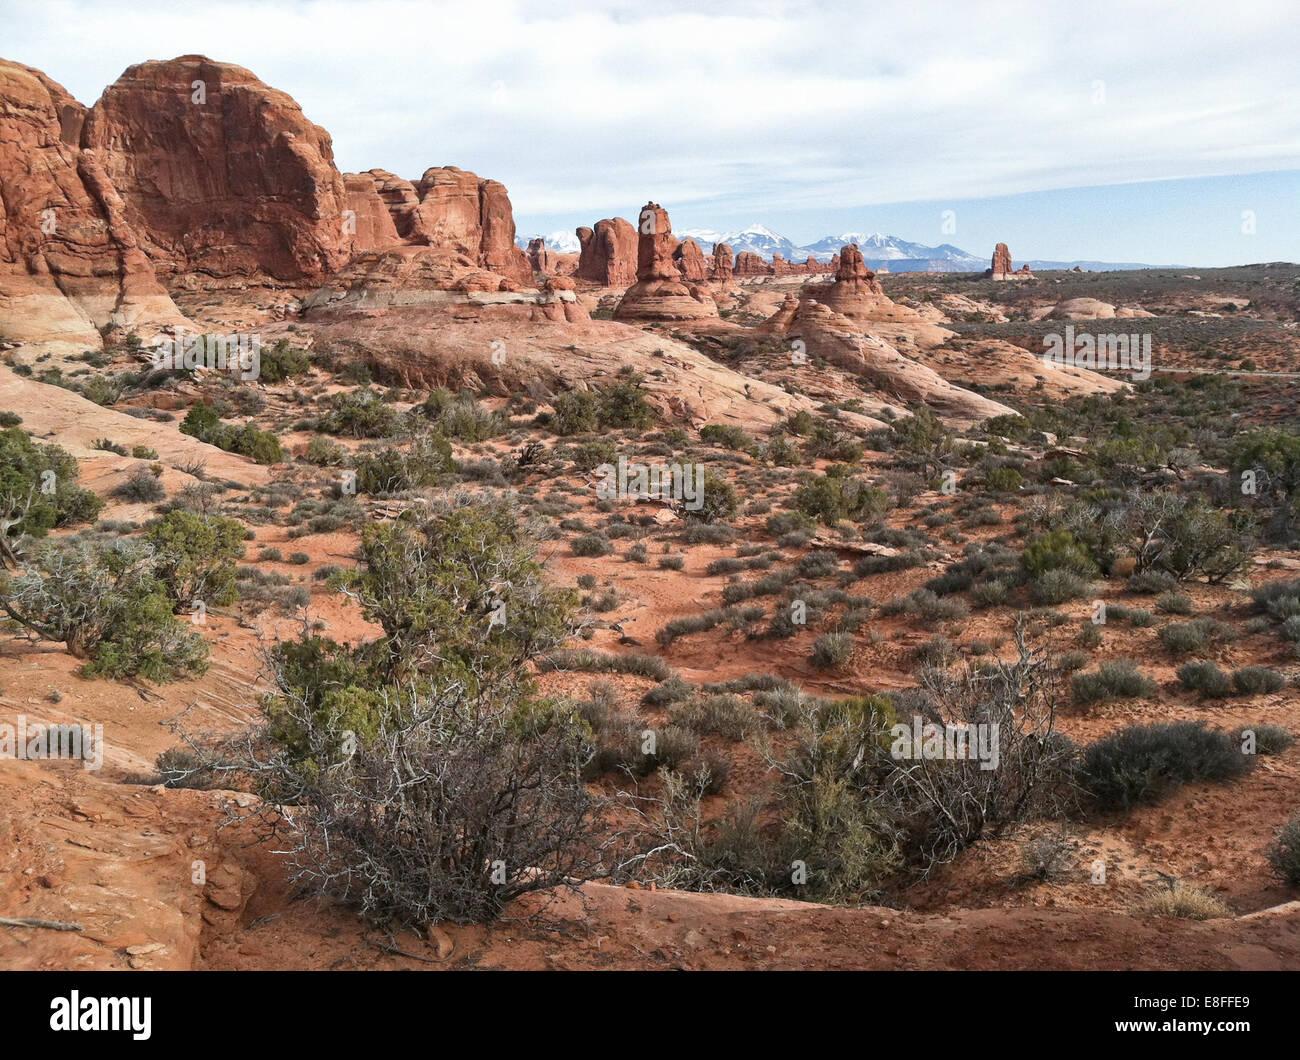 USA, Utah, Arches National Park - Stock Image